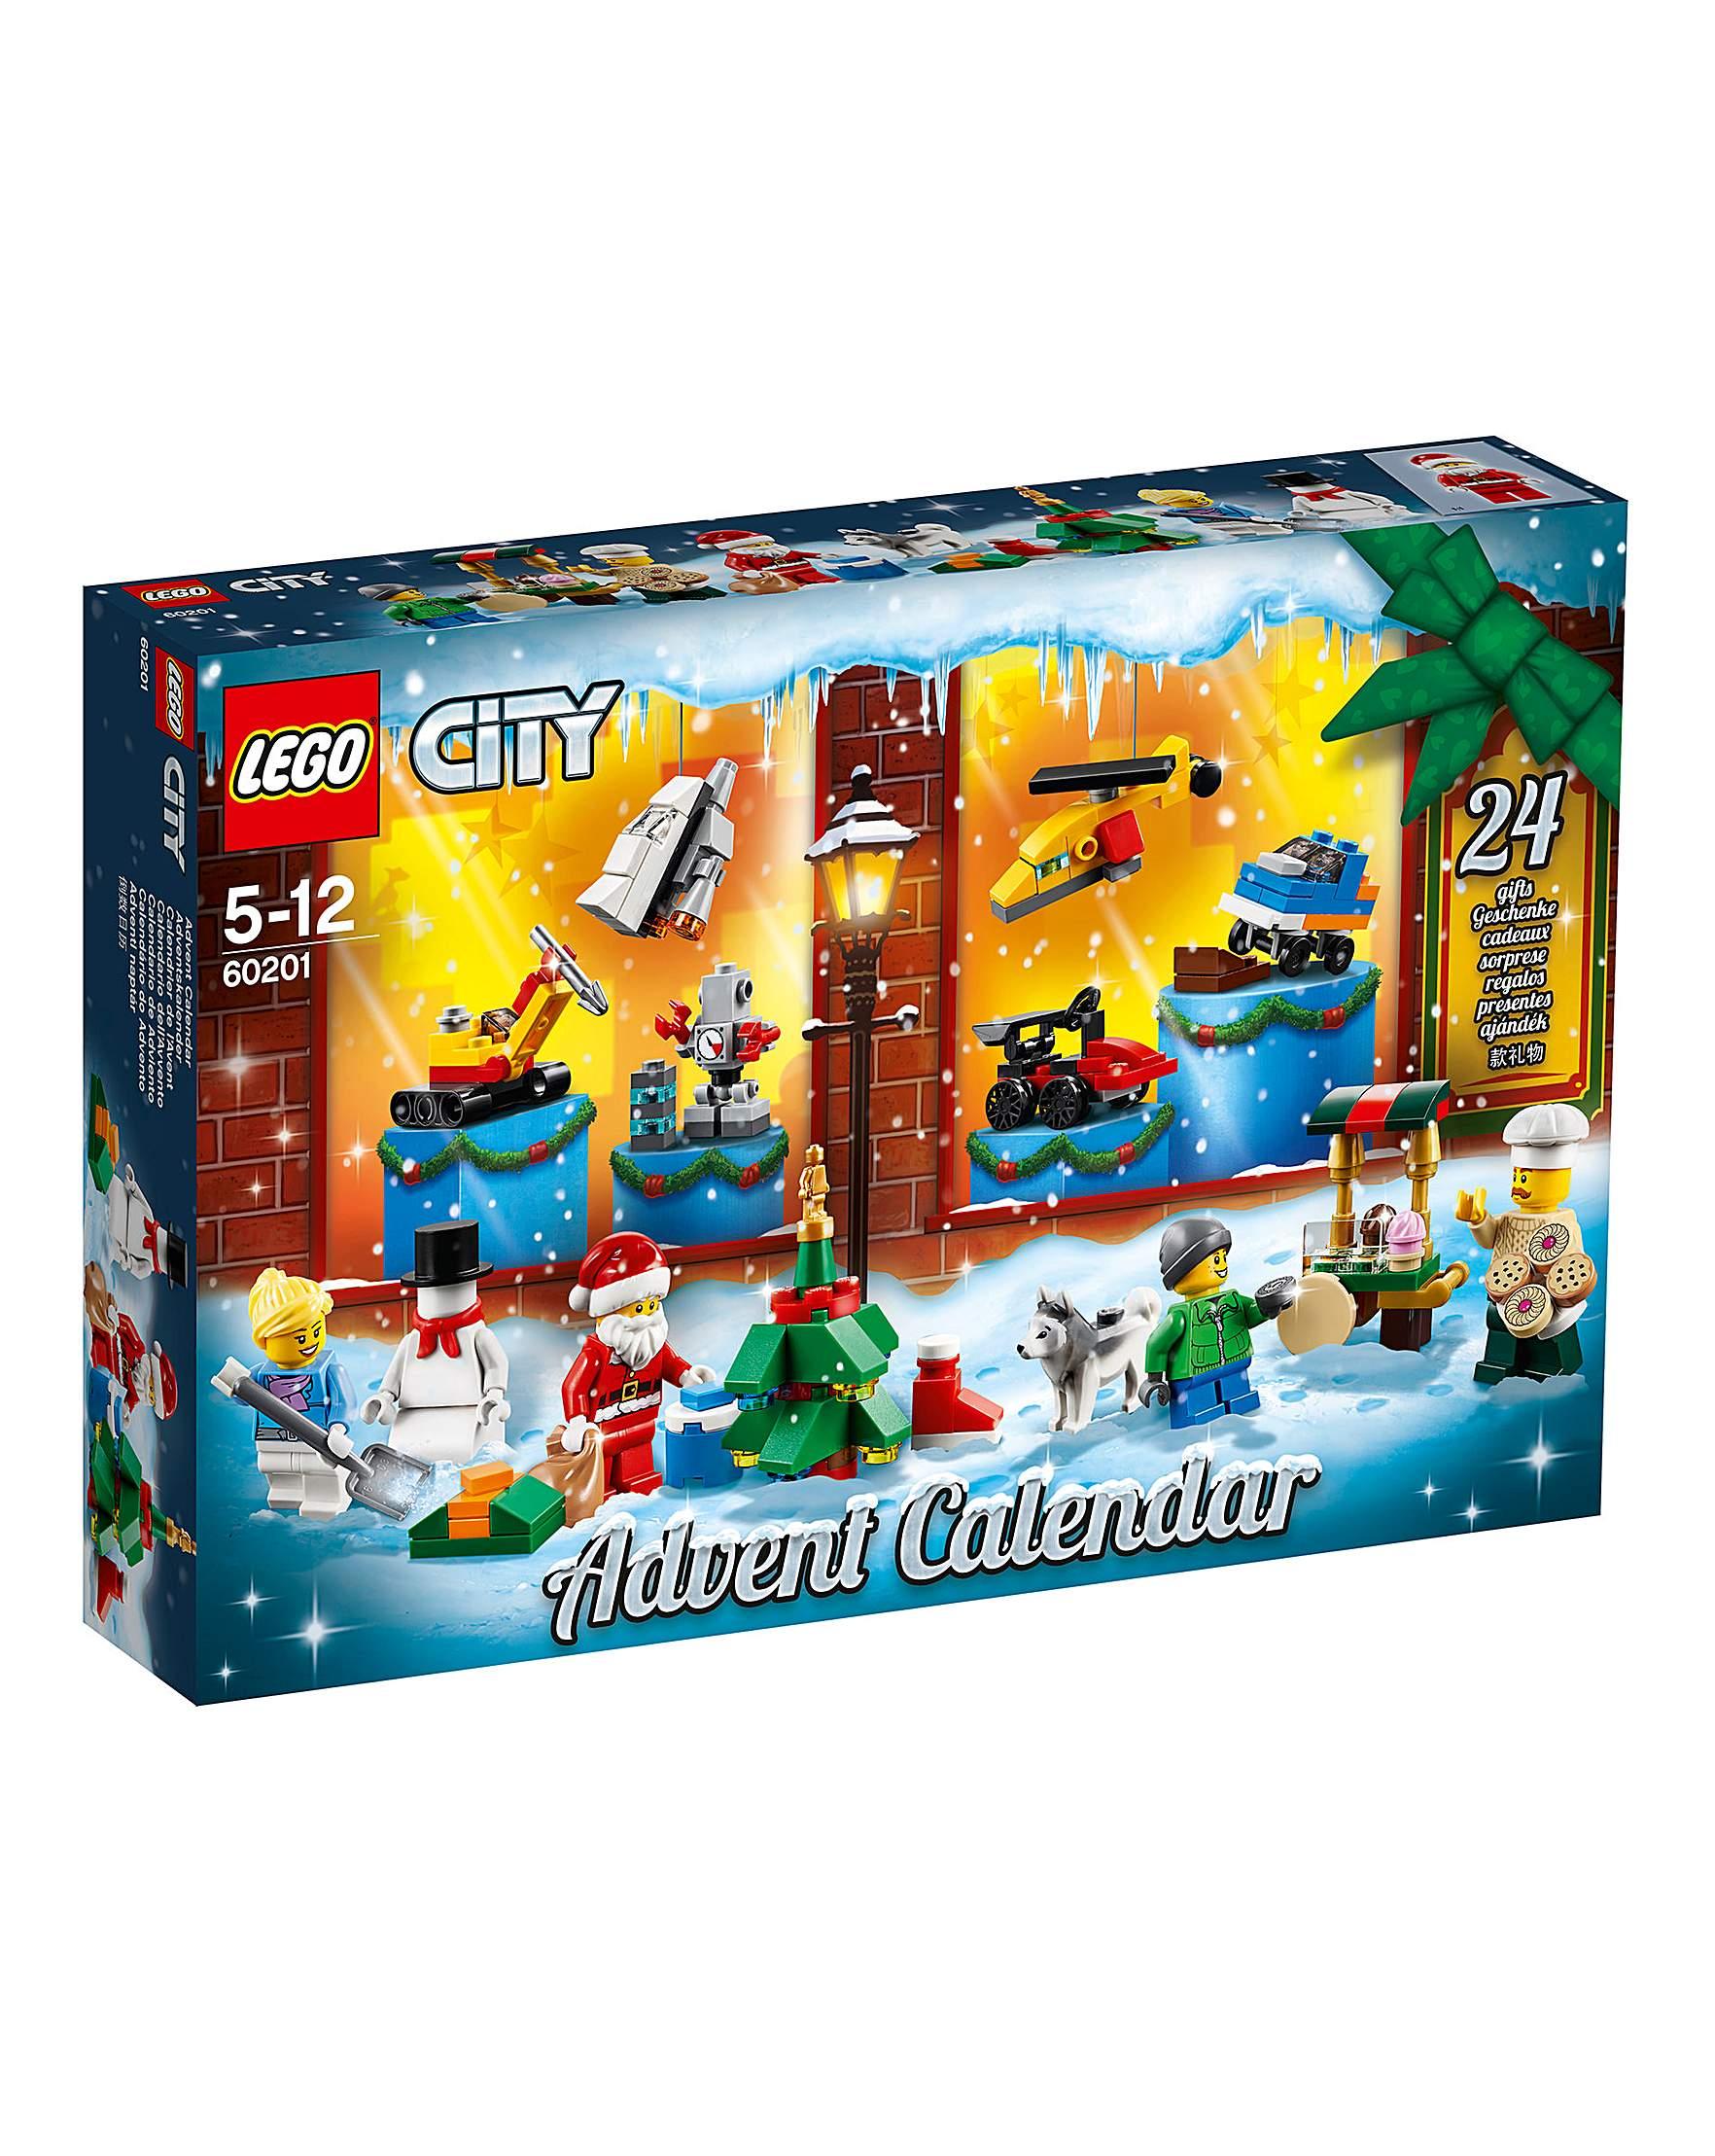 converse naptár LEGO City Advent Calendar | J D Williams converse naptár